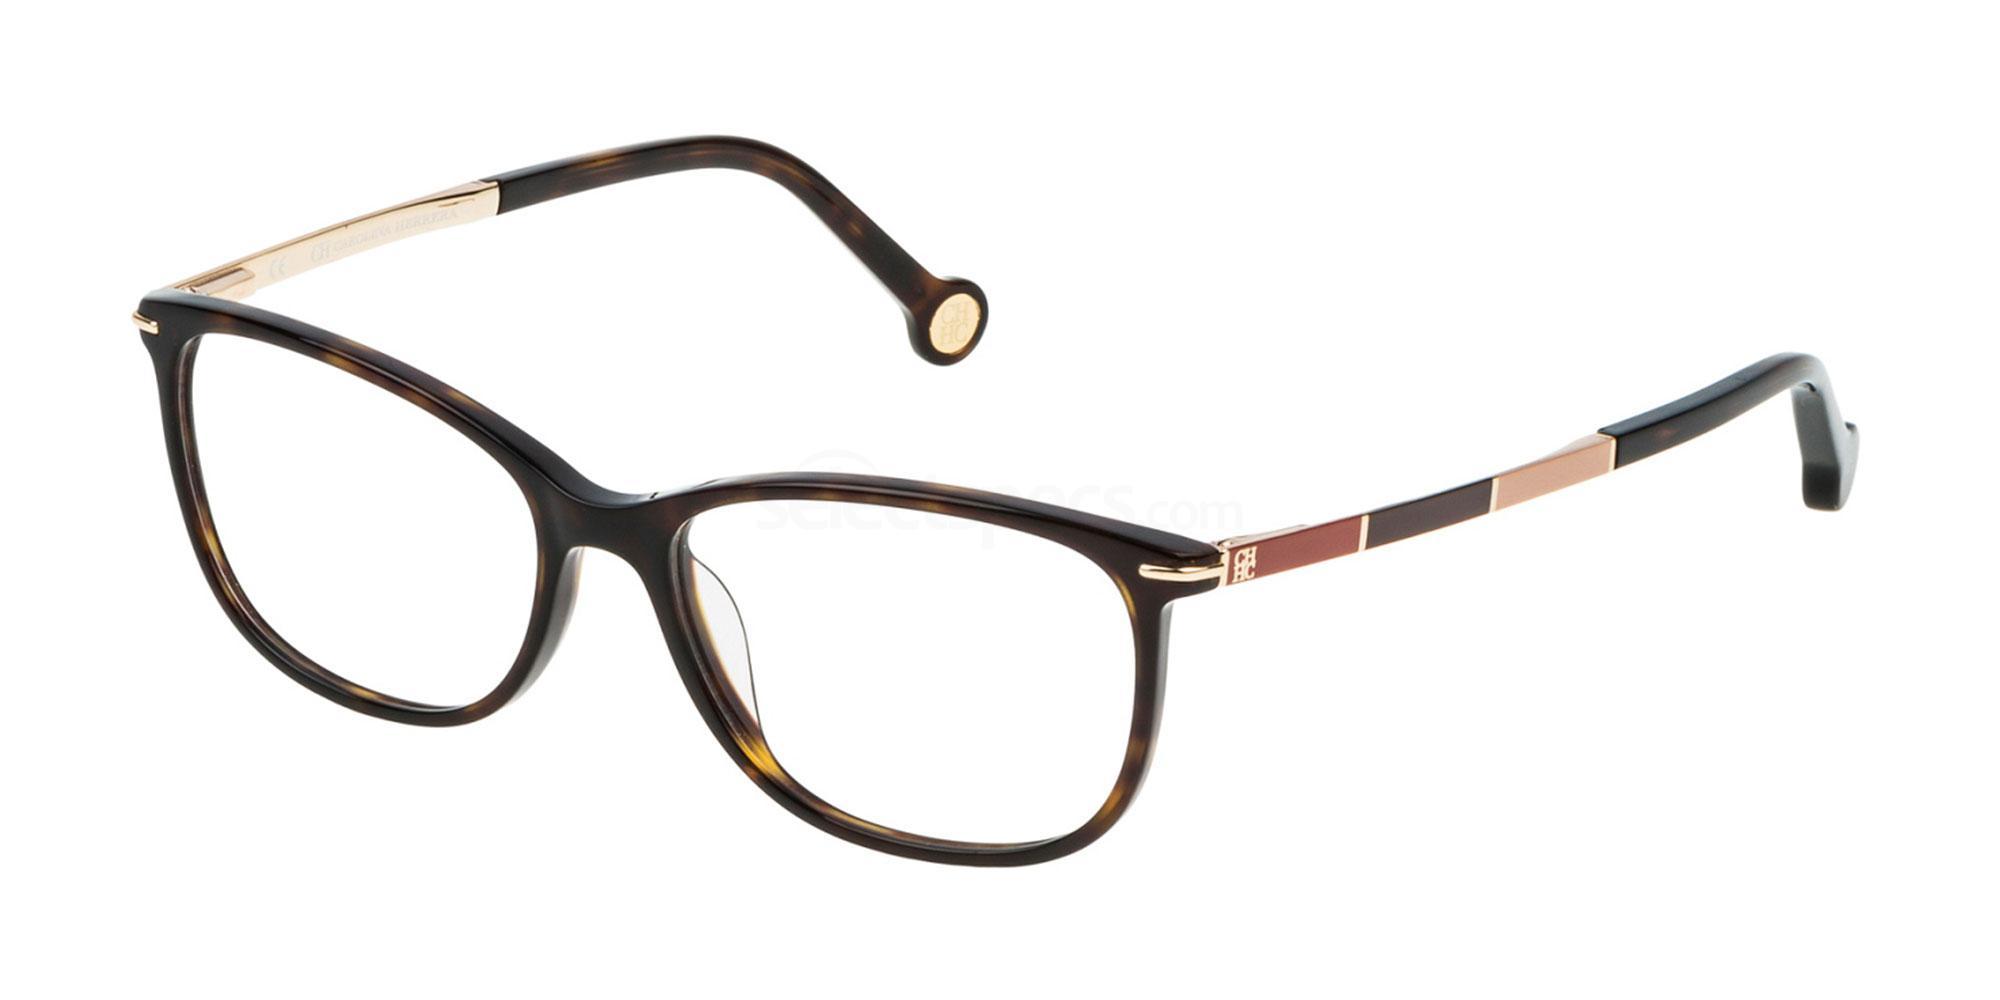 0722 VHE670 Glasses, CH Carolina Herrera